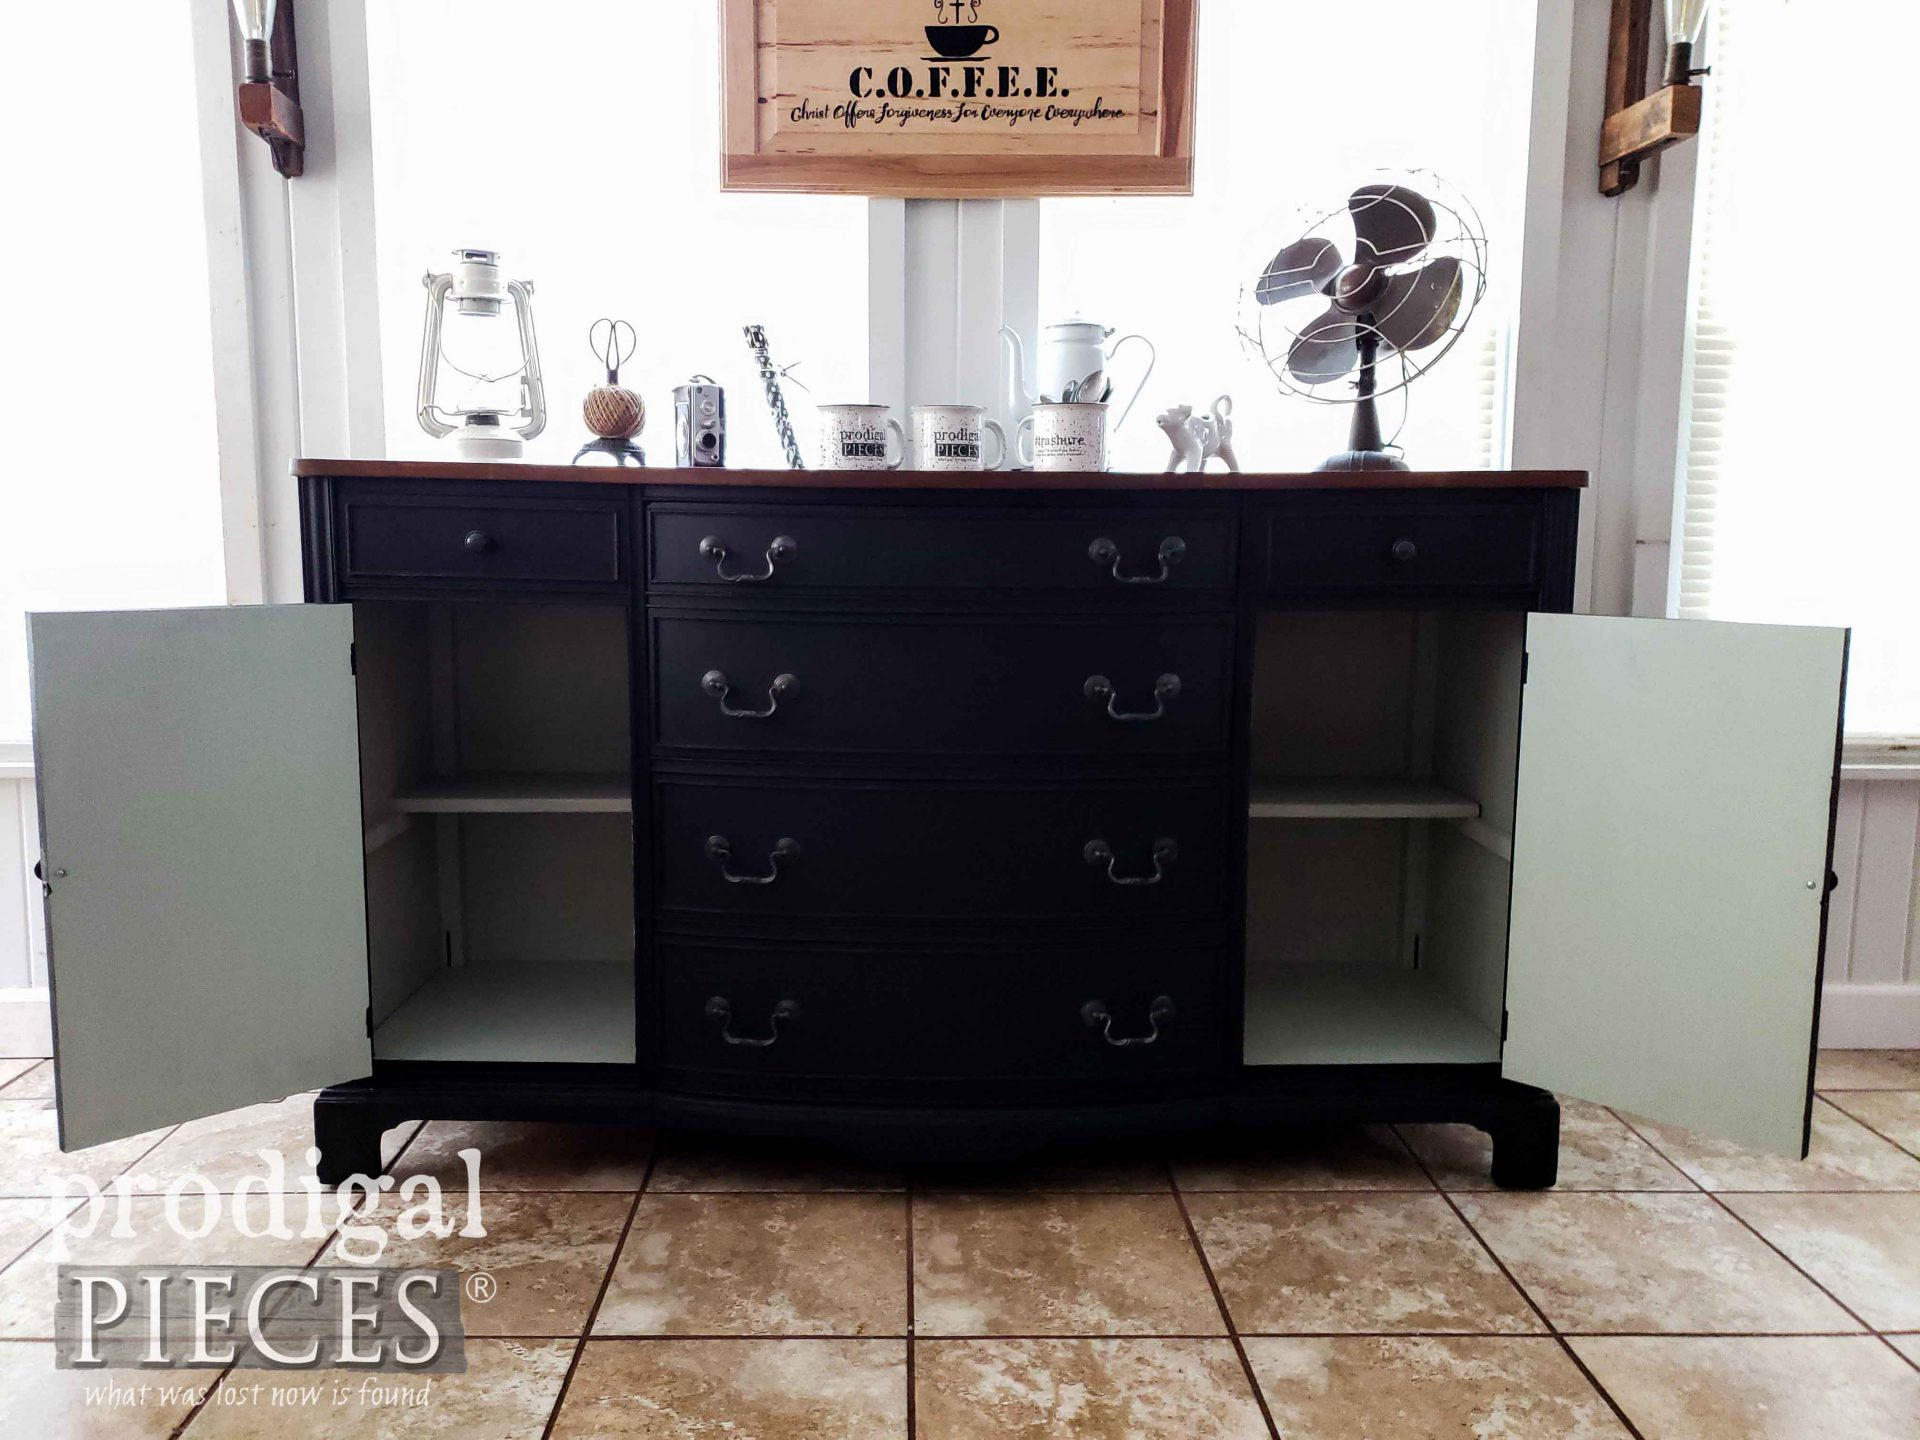 Peek-a-Boo Buffet Cabinets by Larissa of Prodigal Pieces   prodigalpieces #prodigalpieces #diy #home #homedecor #farmhouse #vintage #coffee